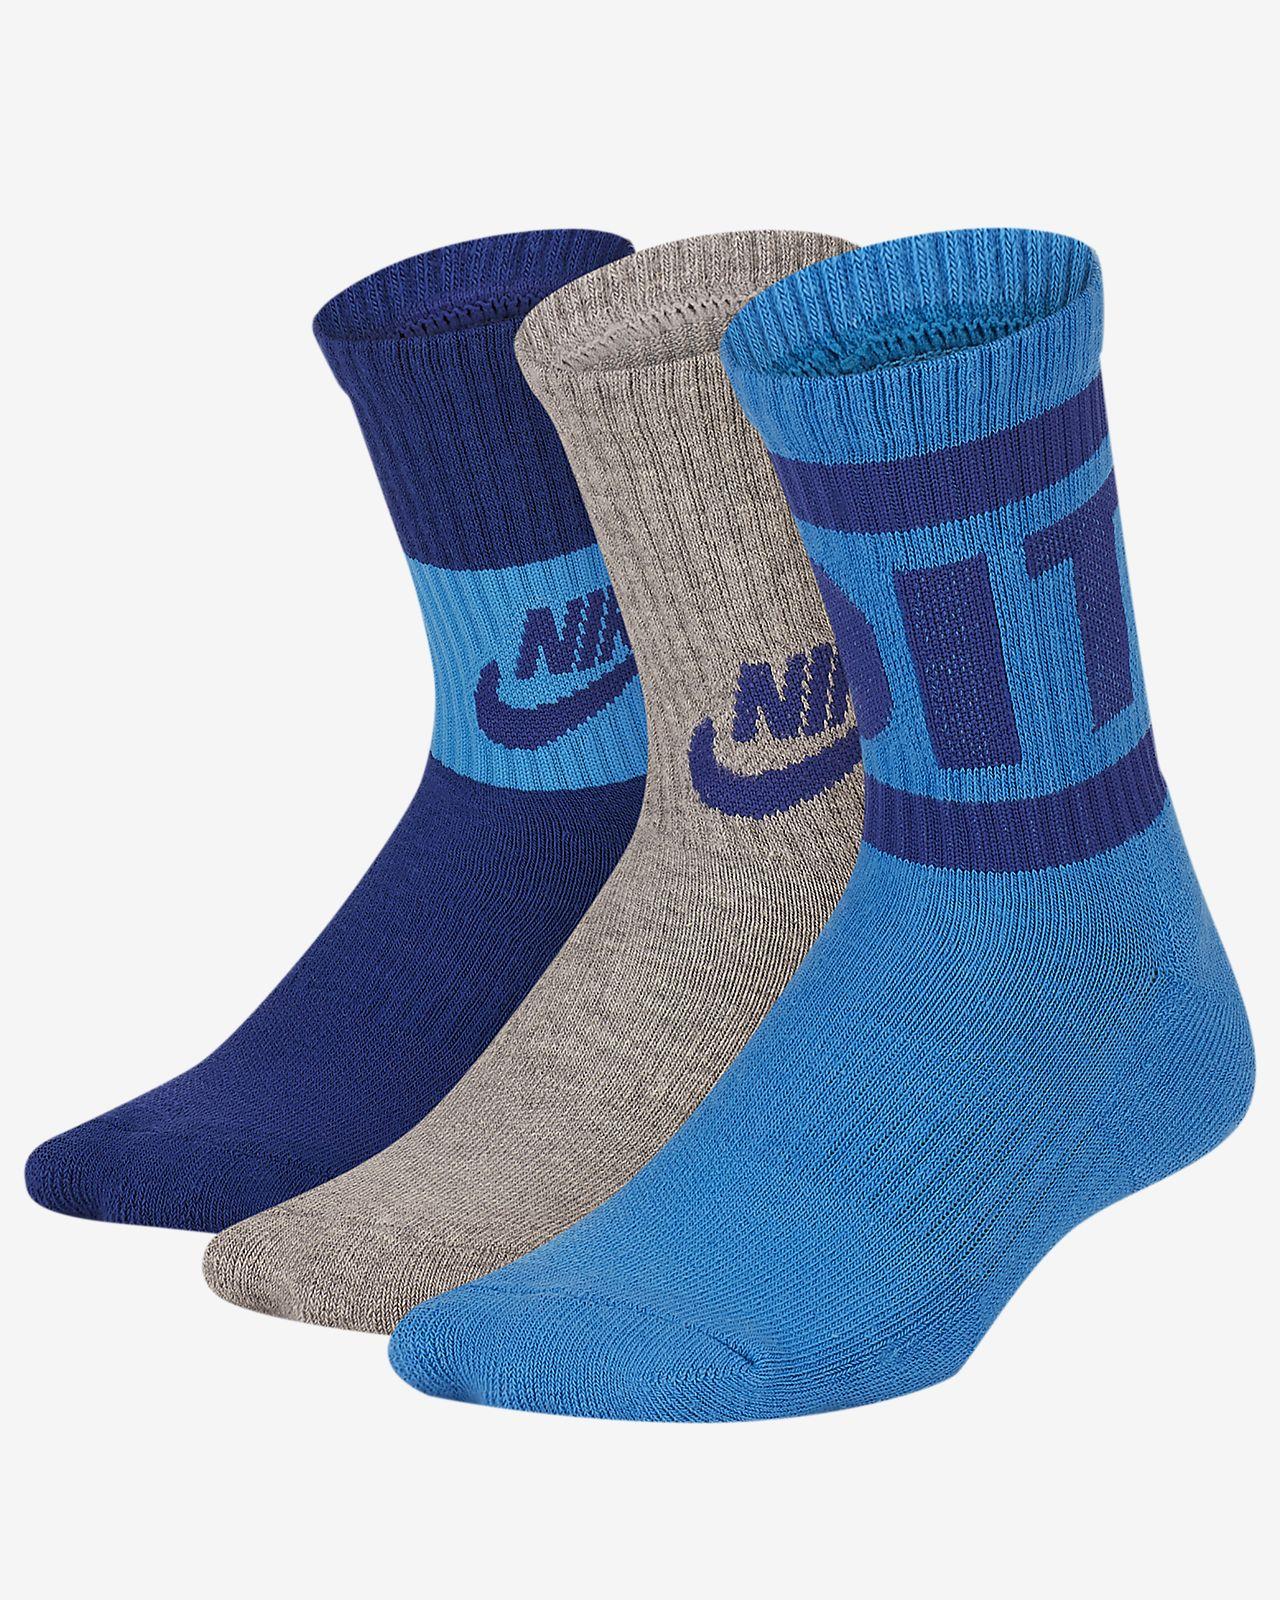 promo code 048eb efb32 Nike Little Kids  JDI Cushioned Crew Socks (3 Pairs). Nike.com